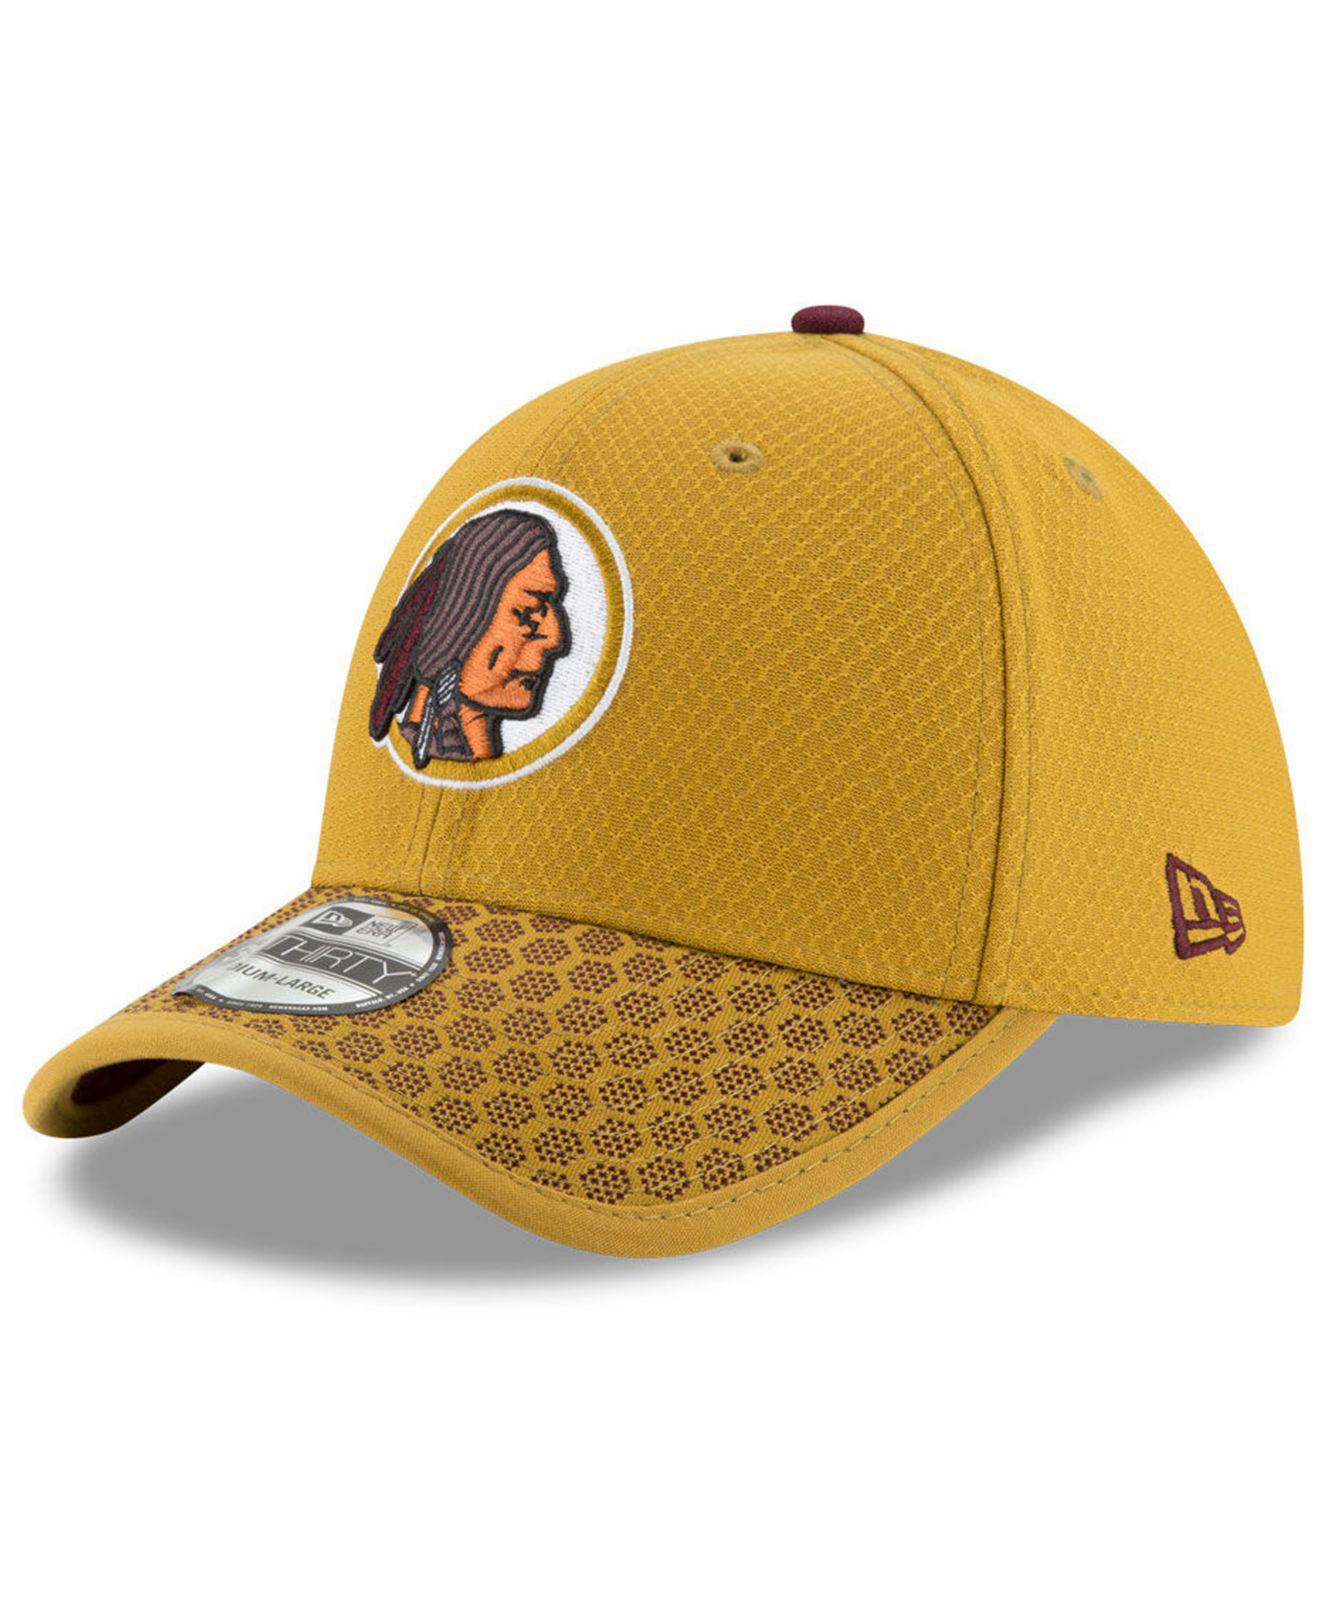 a76bf3fd3e757 coupon code for detroit lions new era nfl logo surge 39thirty cap 642a7  e9ec5  closeout ktz. mens washington redskins sideline 39thirty cap 3f63c  4215e